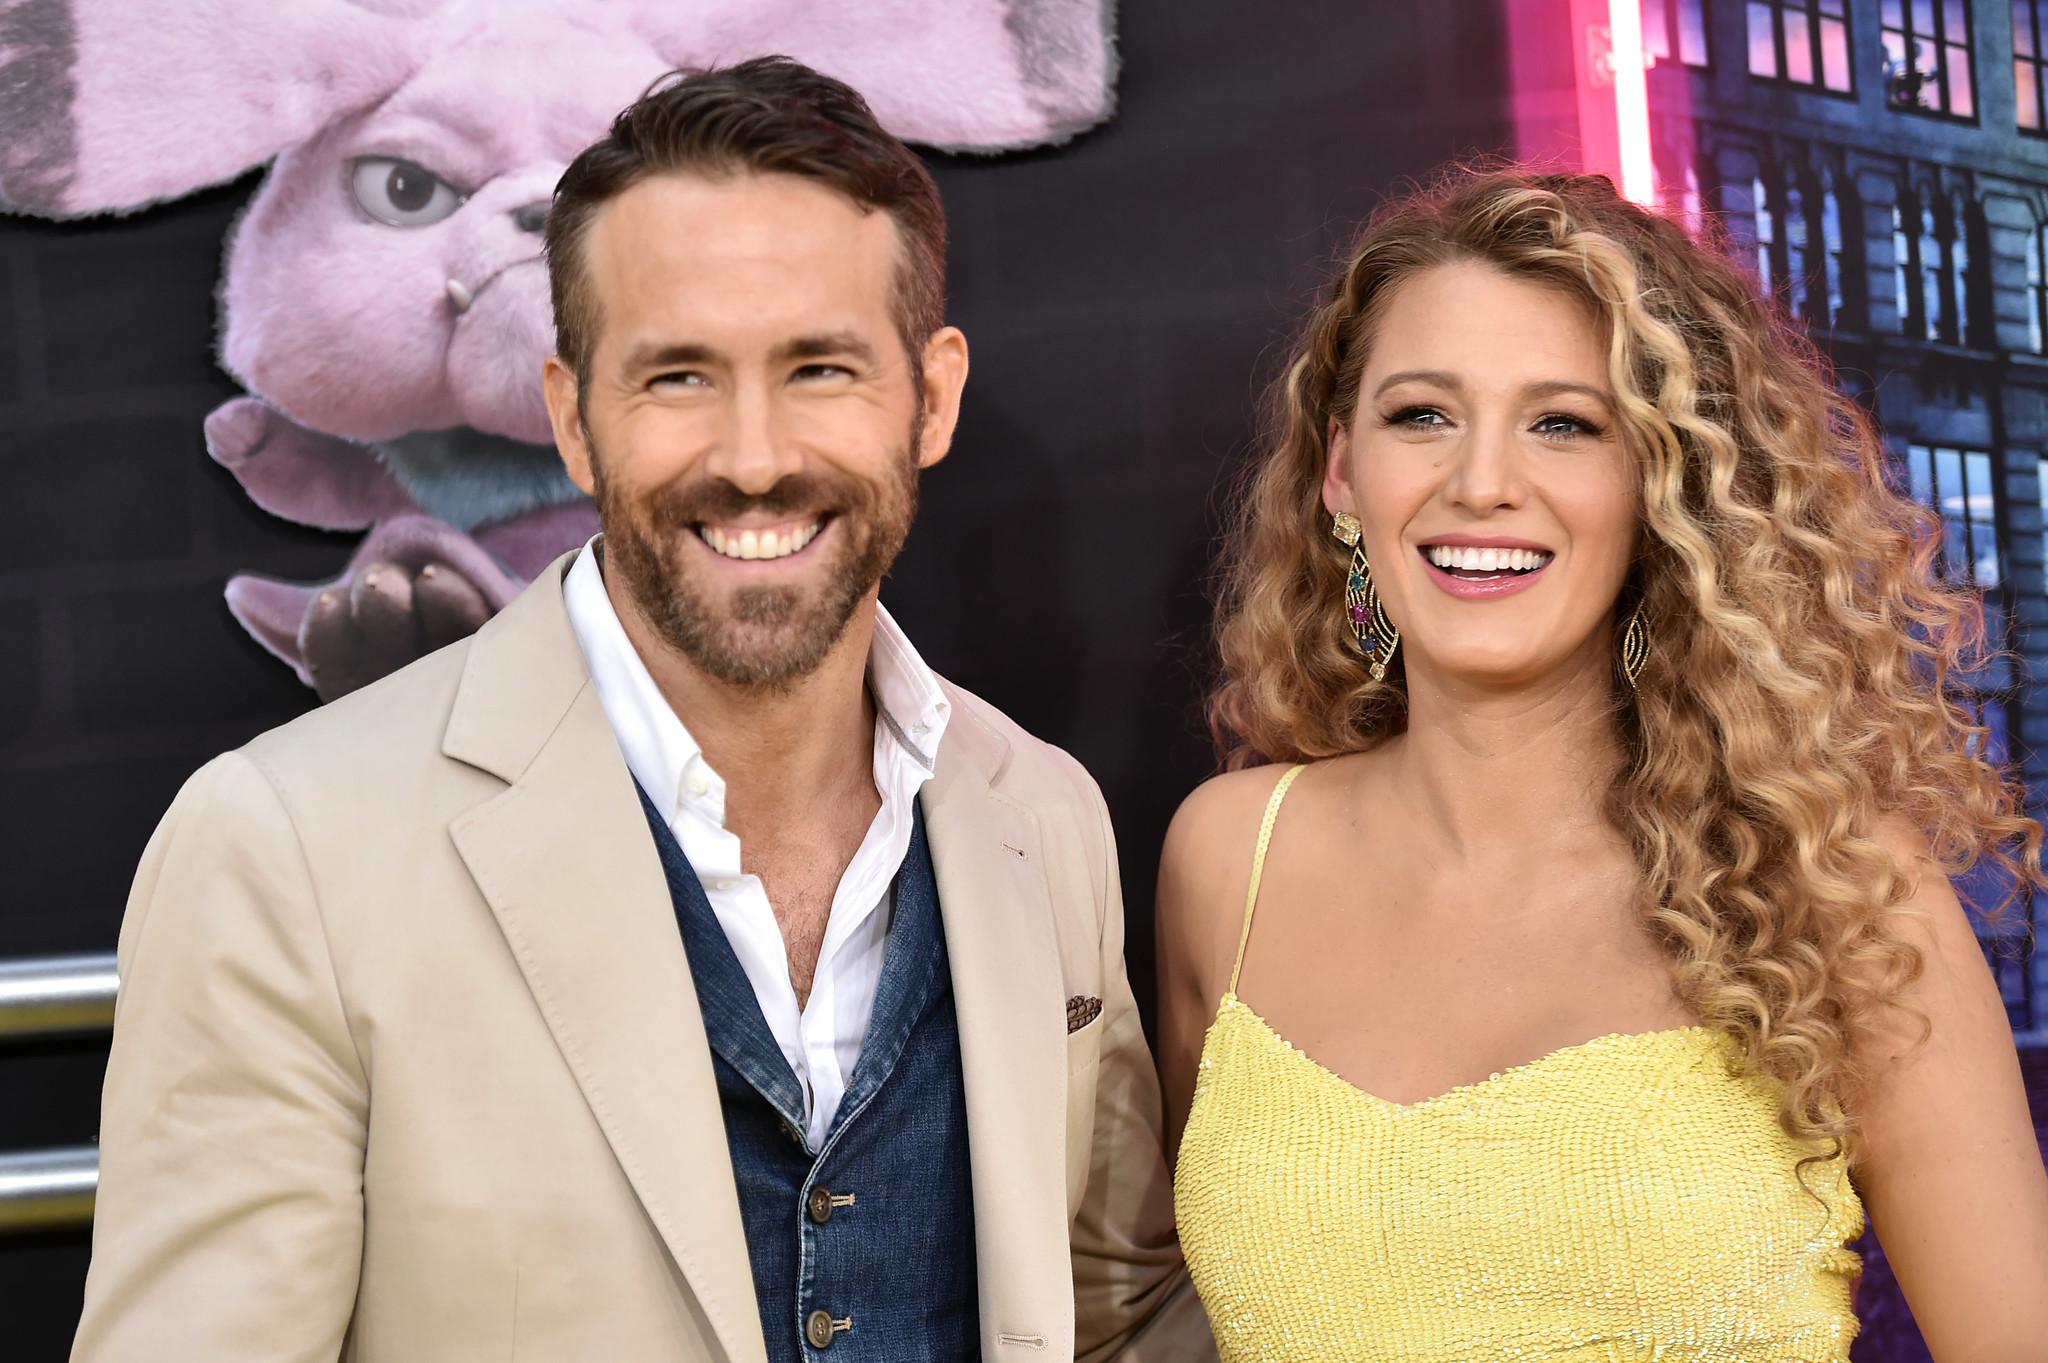 Ryan Reynolds and Blake Lively donate $400K to New York hospitals